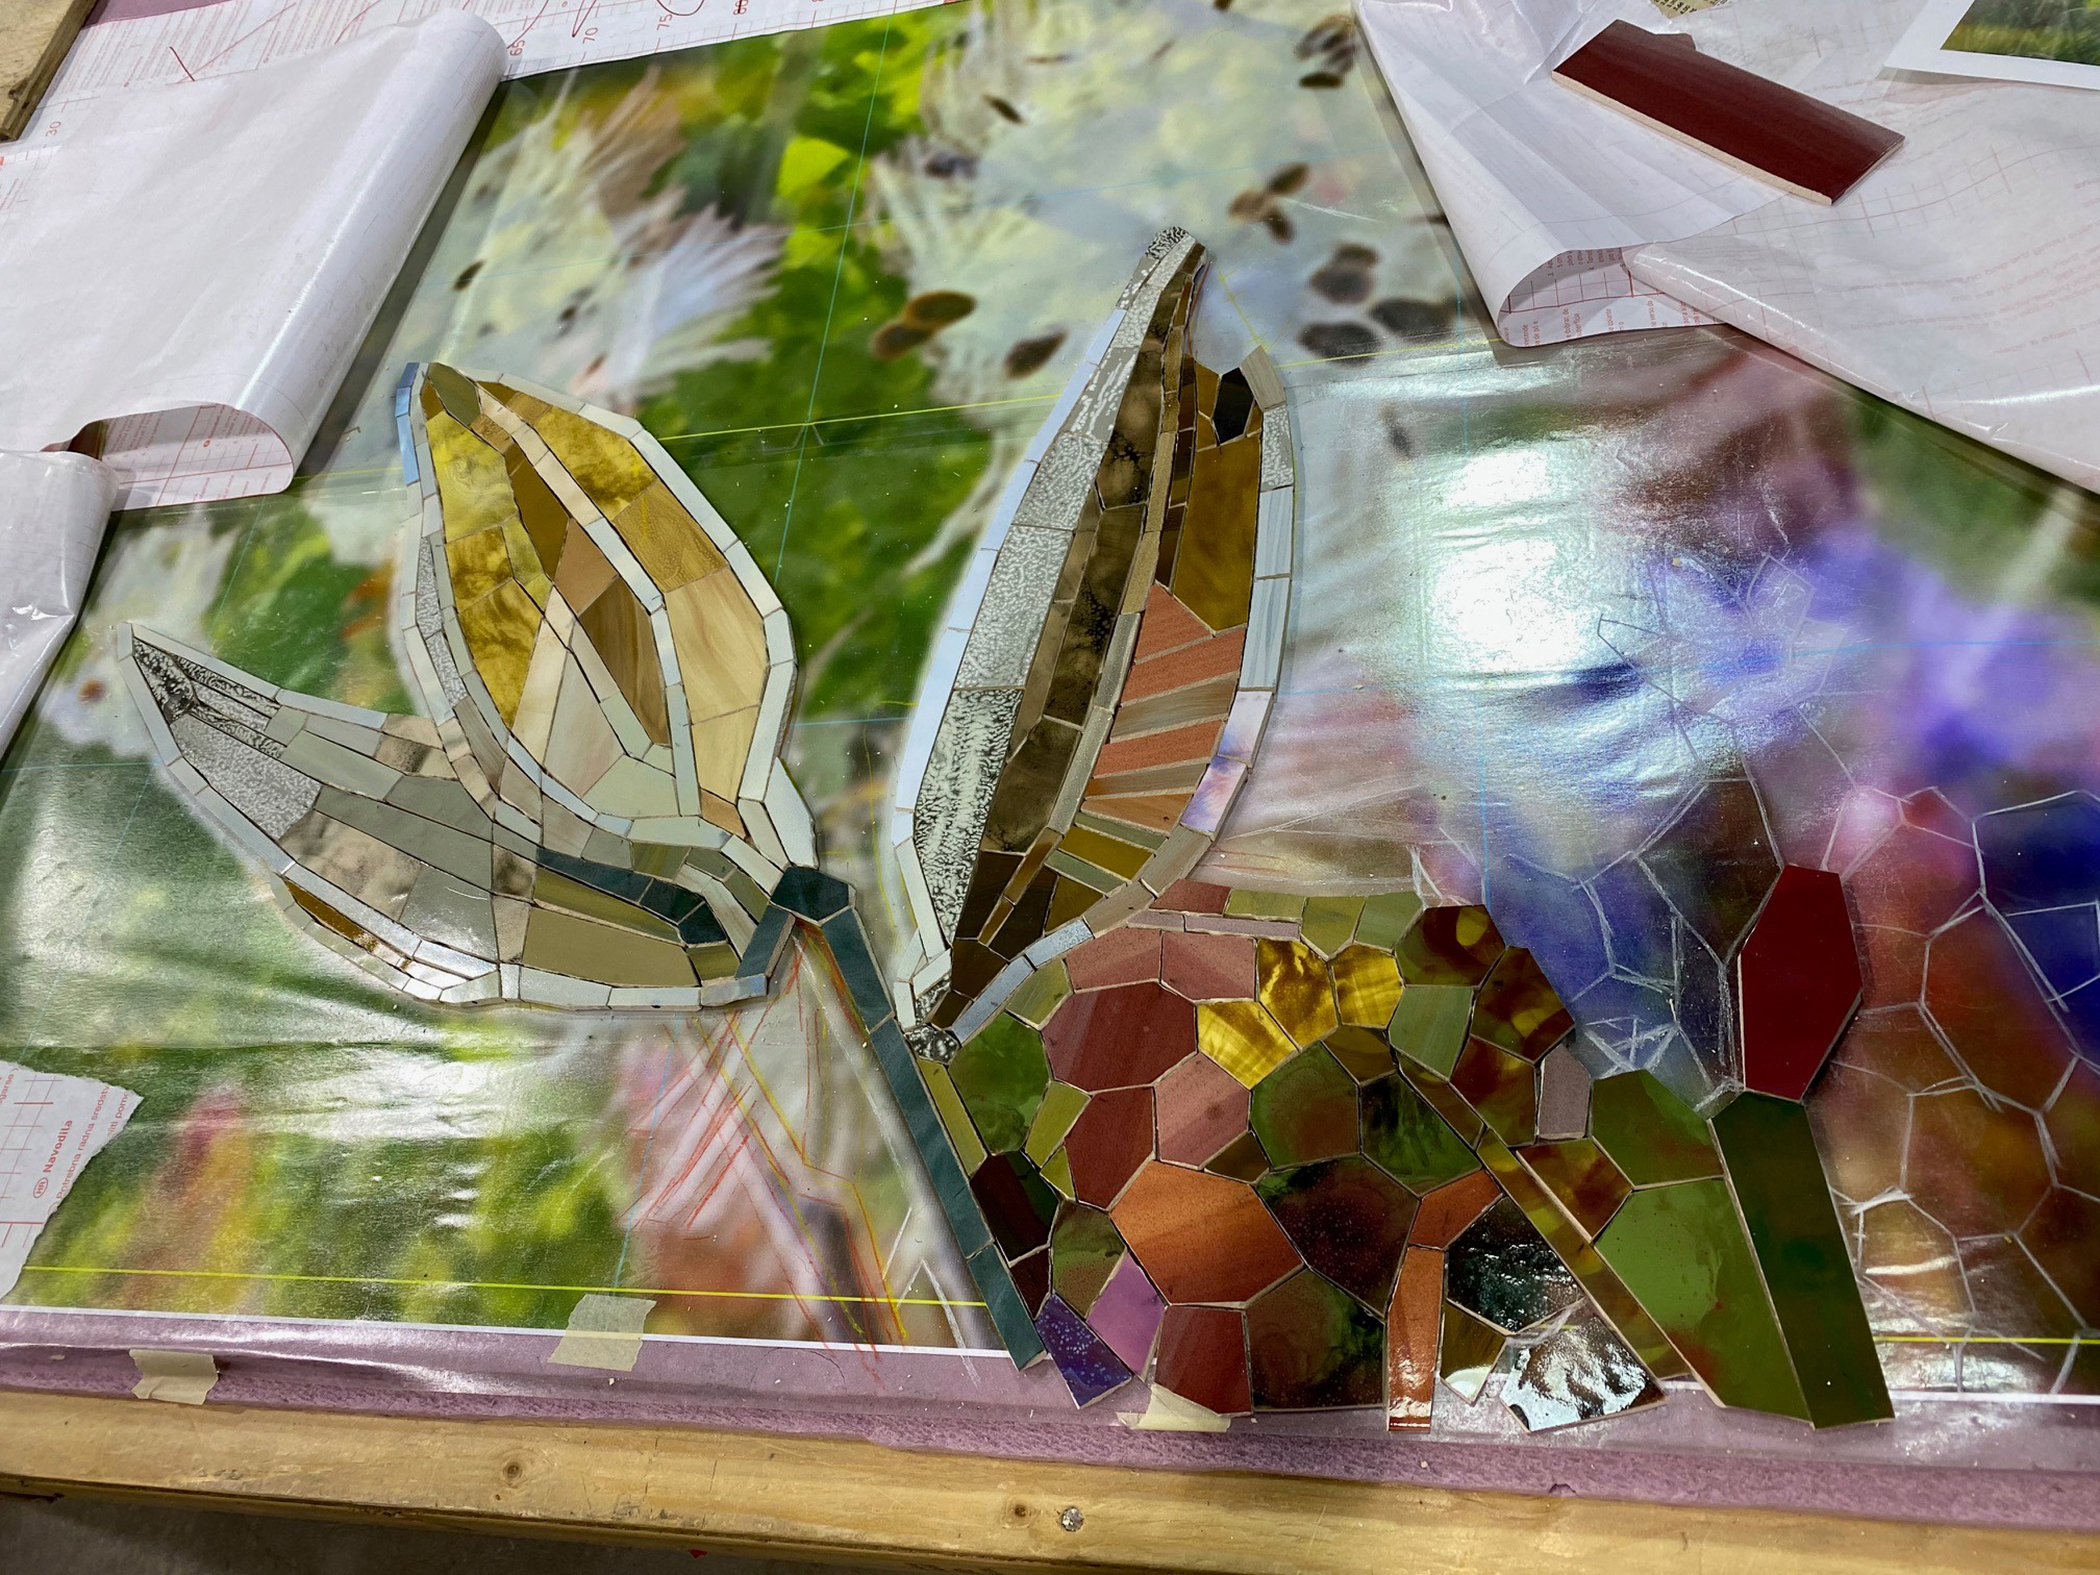 Chester Subway 2020 Florae (milkweed closeup) mosaics in progress © Mosaika Art Mosaic Fabricator